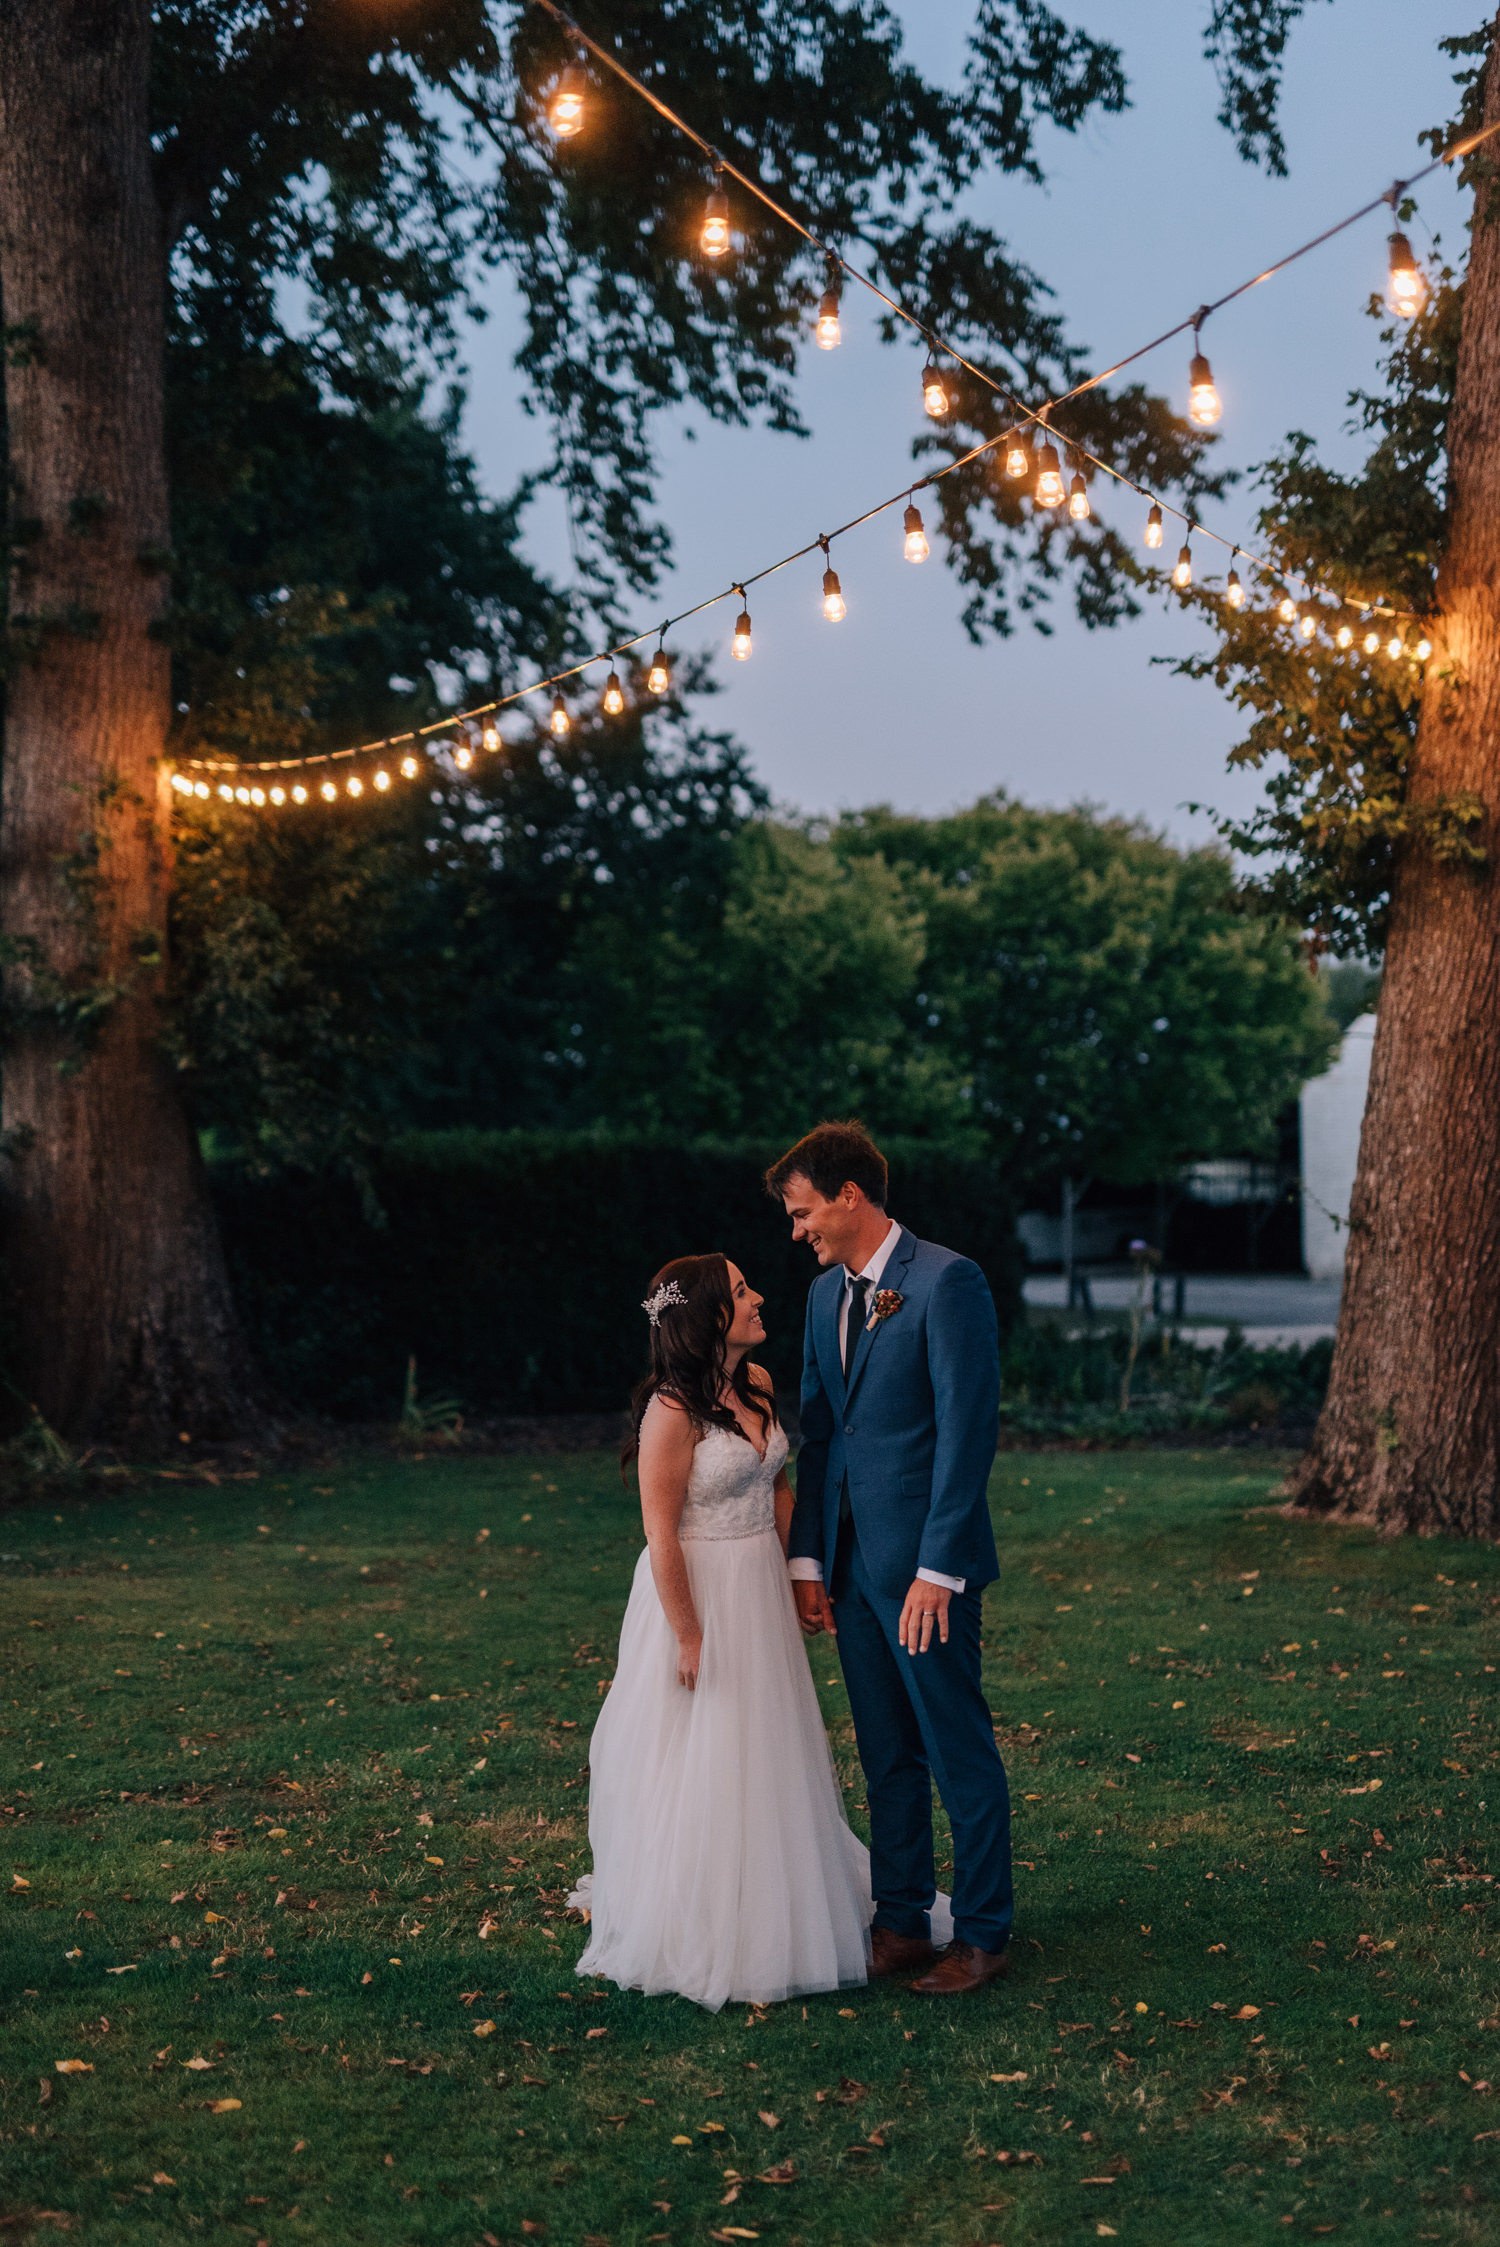 Quamby-Wedding-Photographer-159.jpg